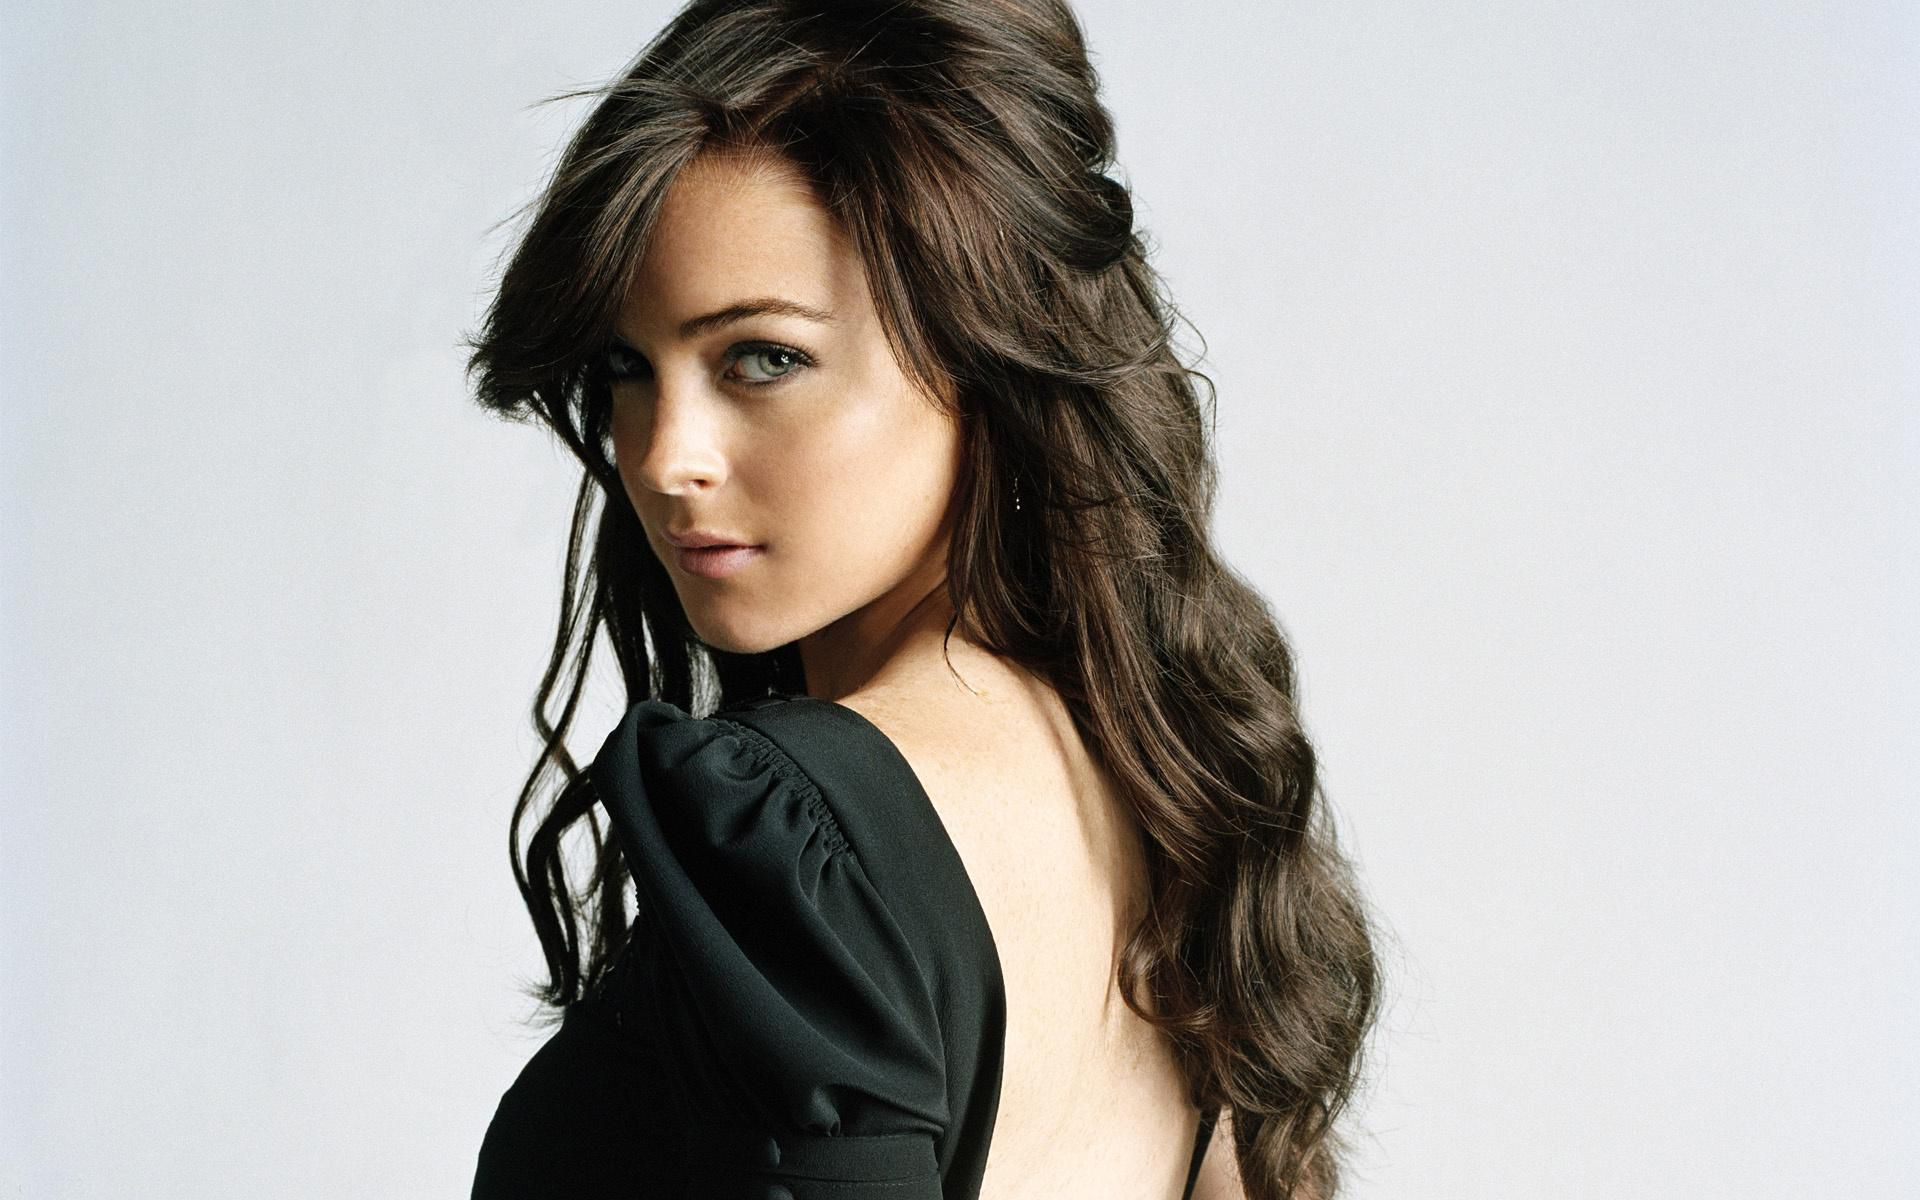 Beautiful Lindsay Lohan Hd Wallpapers Lindsay Lohan Celebrities